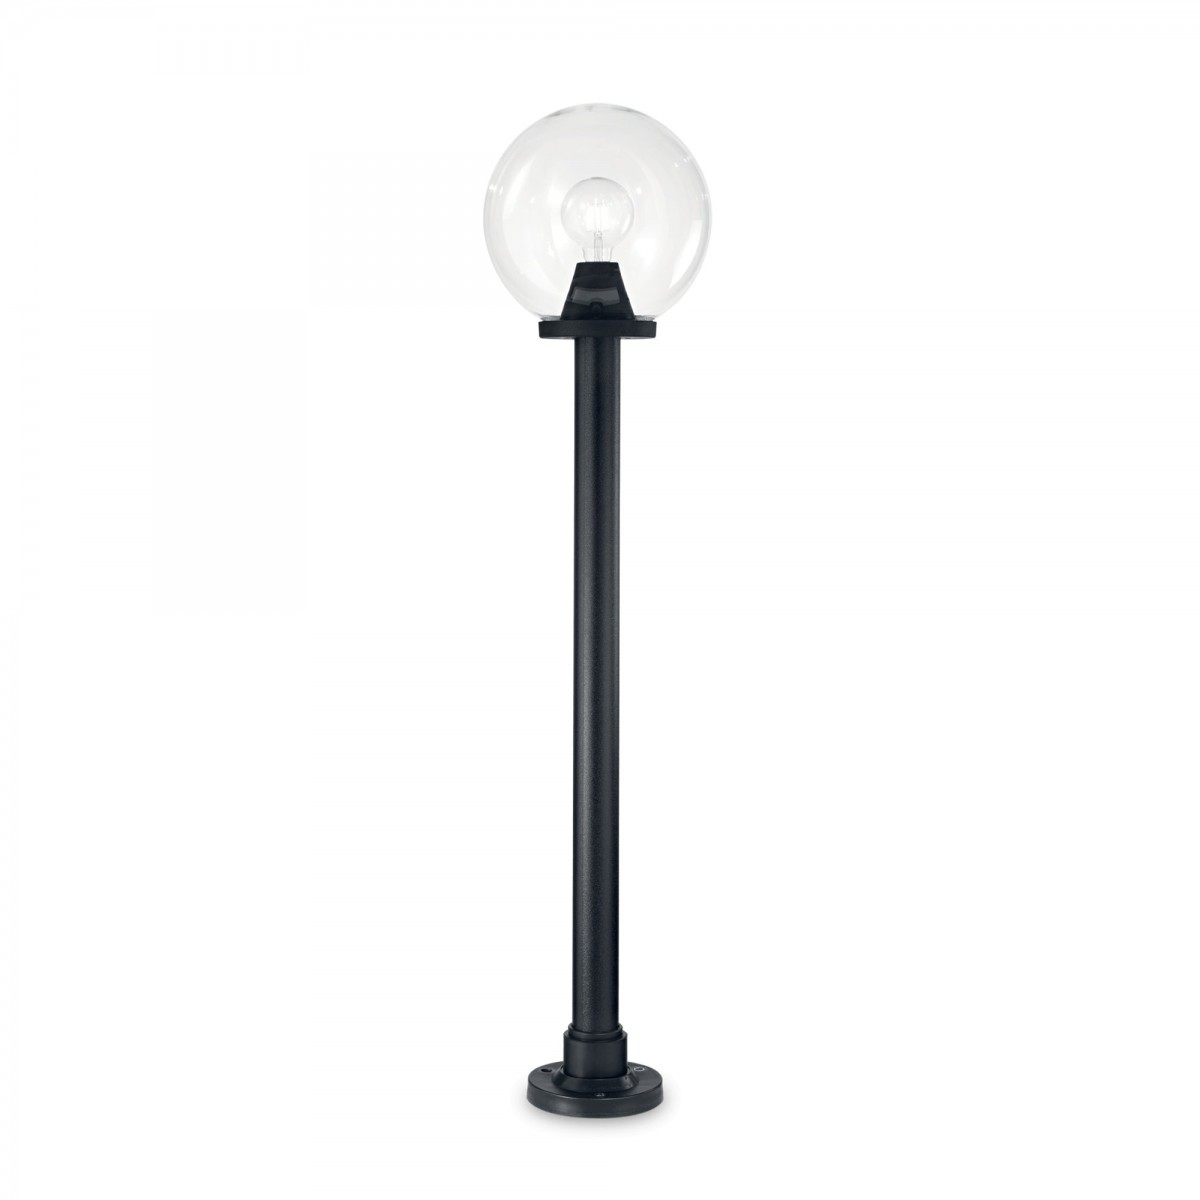 Ideal Lux 187532 venkovní lampa Classic Globe 1x23W|E27